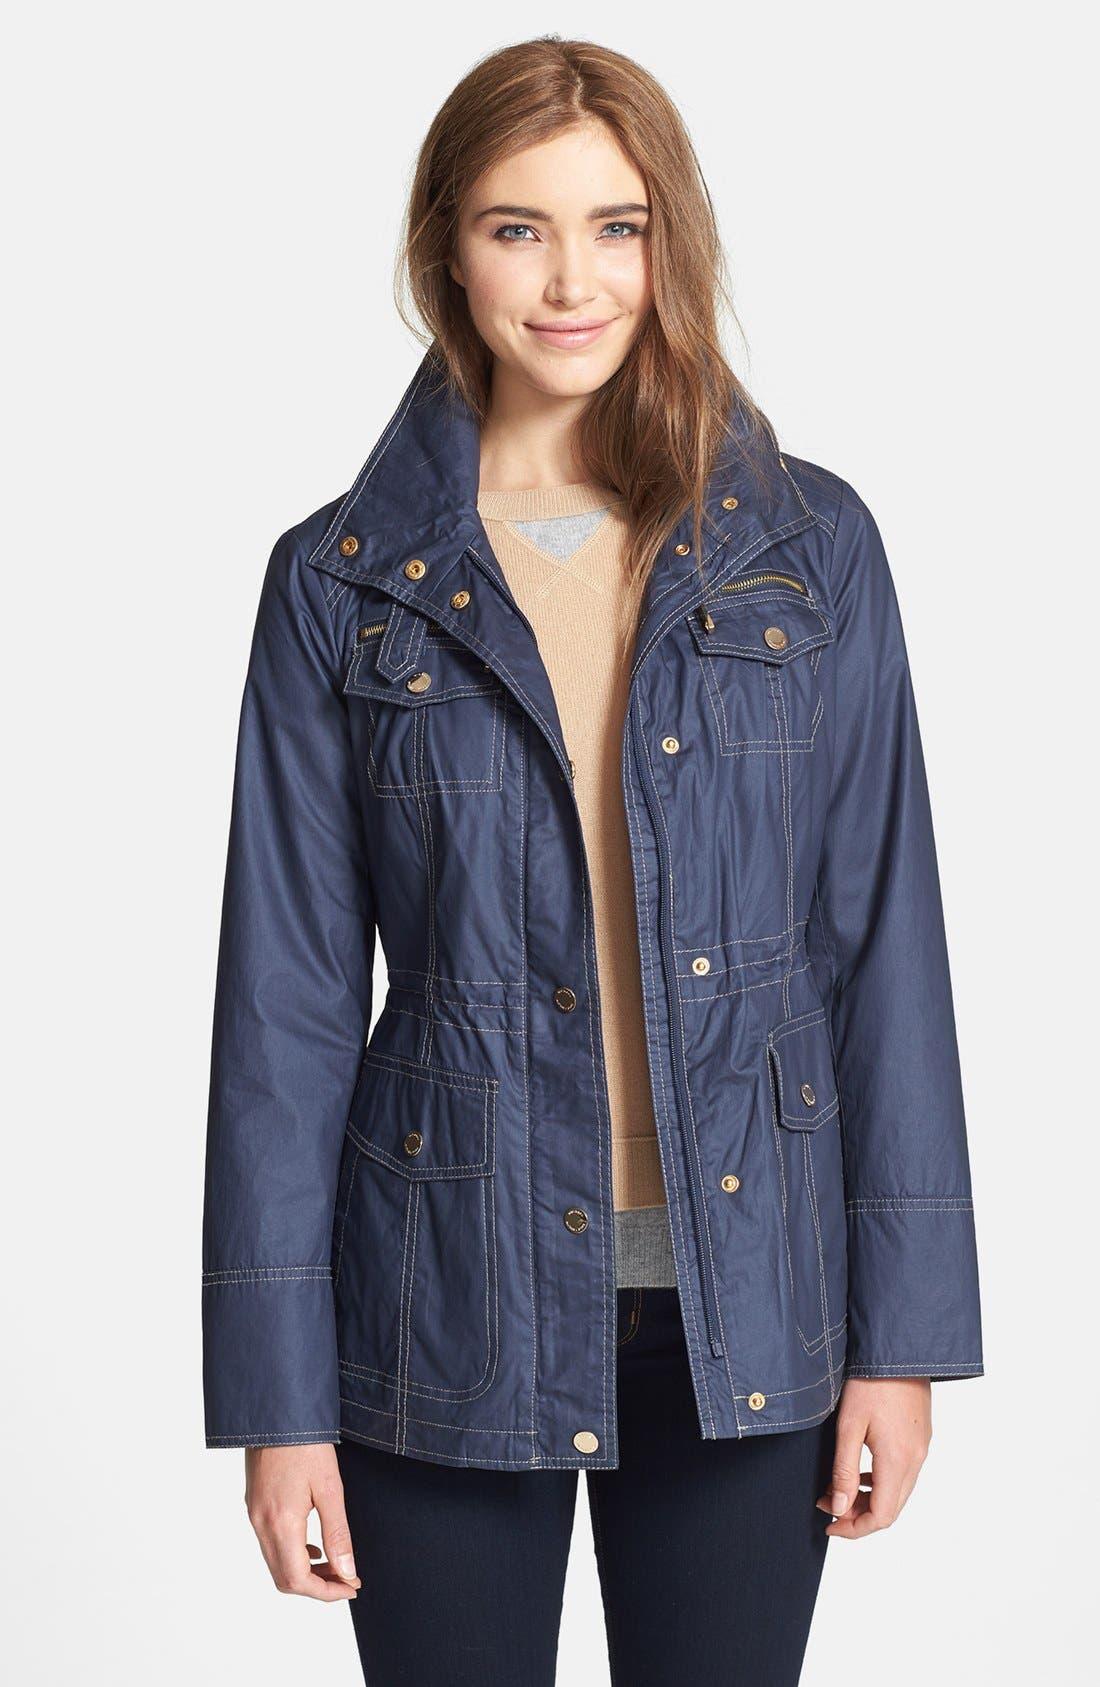 Main Image - MICHAEL Michael Kors Contrast Stitch Waxed Cotton Anorak Jacket